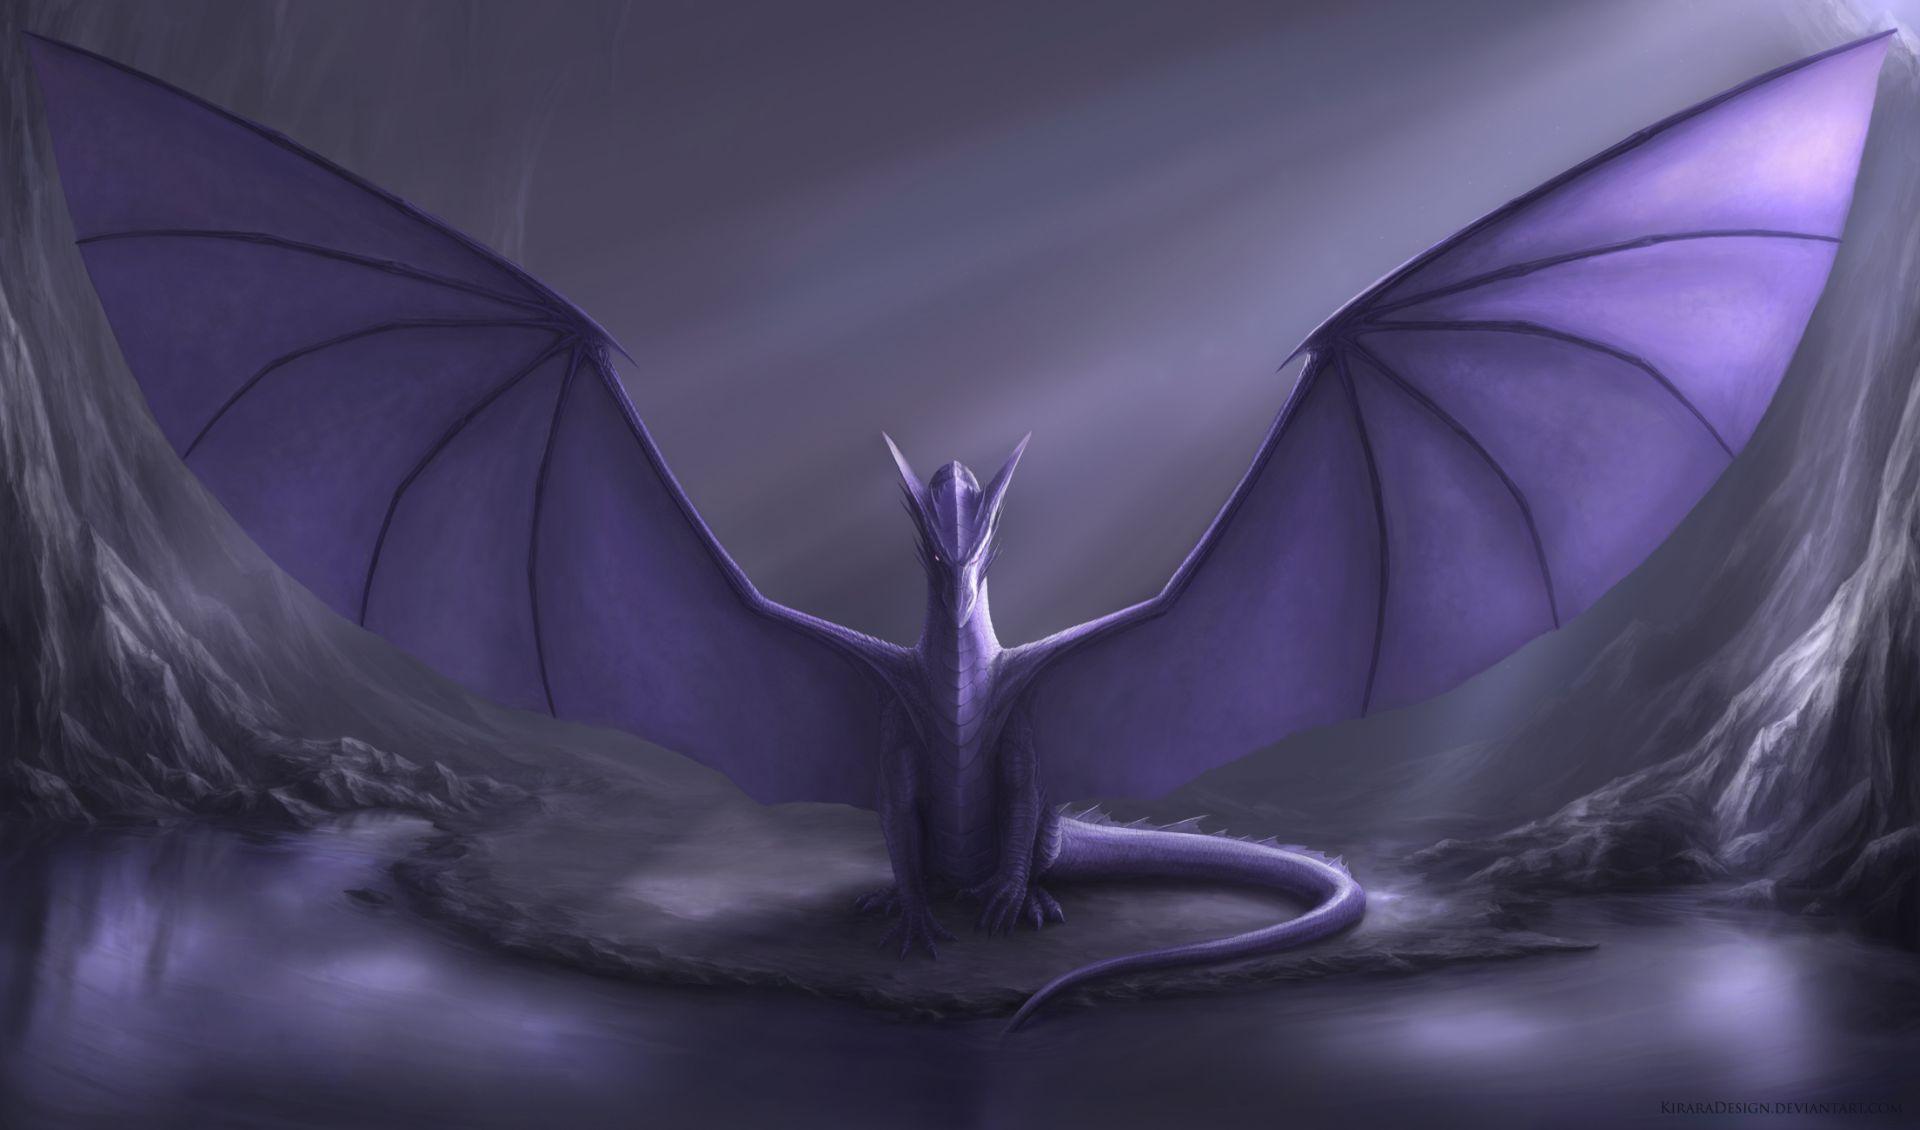 dragon hd art image free download